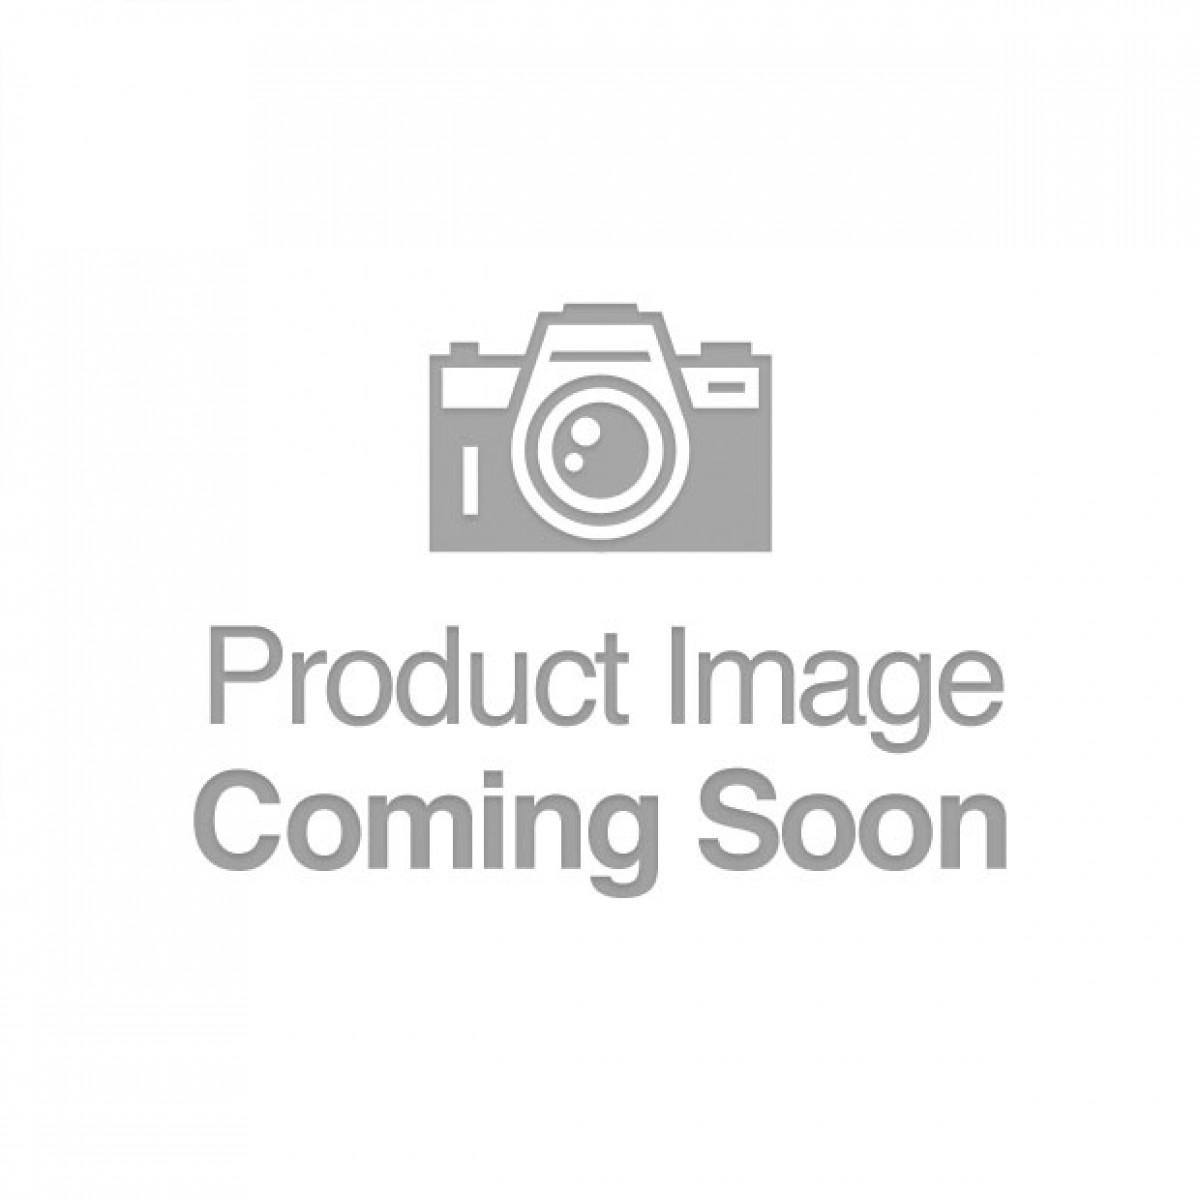 b-Vibe Twist Texture Vibrating Plug X Zoe Ligon - Green